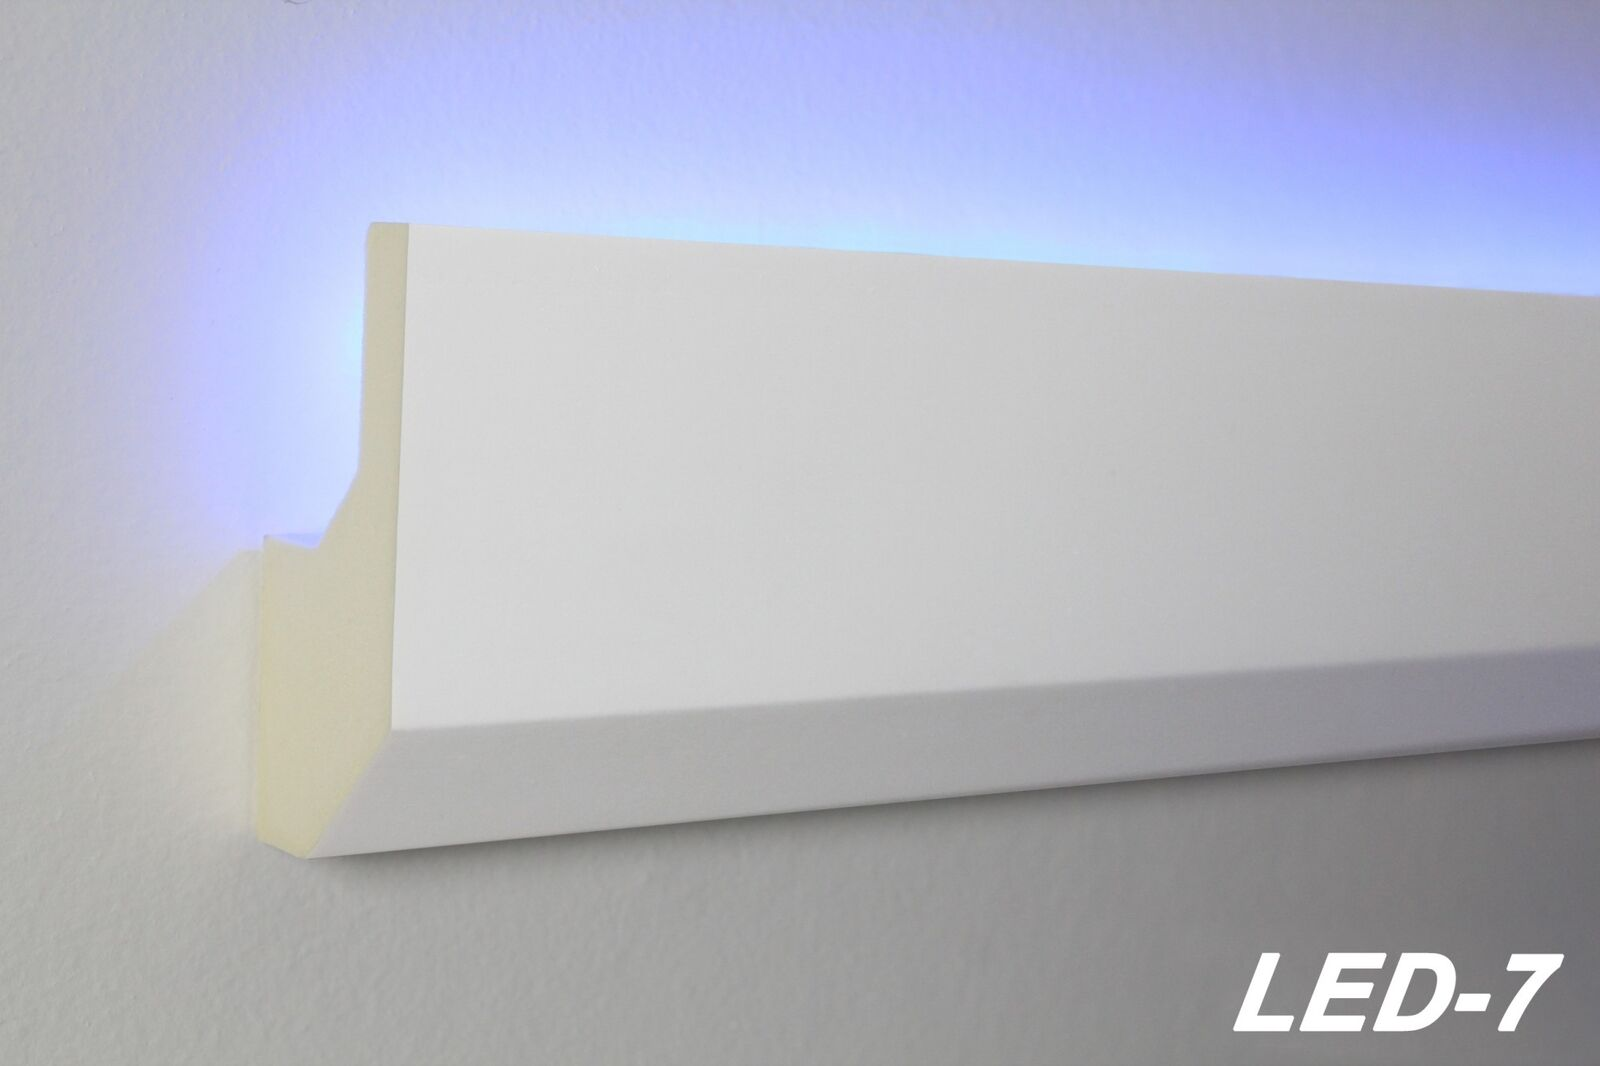 10 Mètres Led Profil Pu Pu Pu Moulure en Stuc Eclairage Indirect Antichoc 80x33, LED-7 e727e6